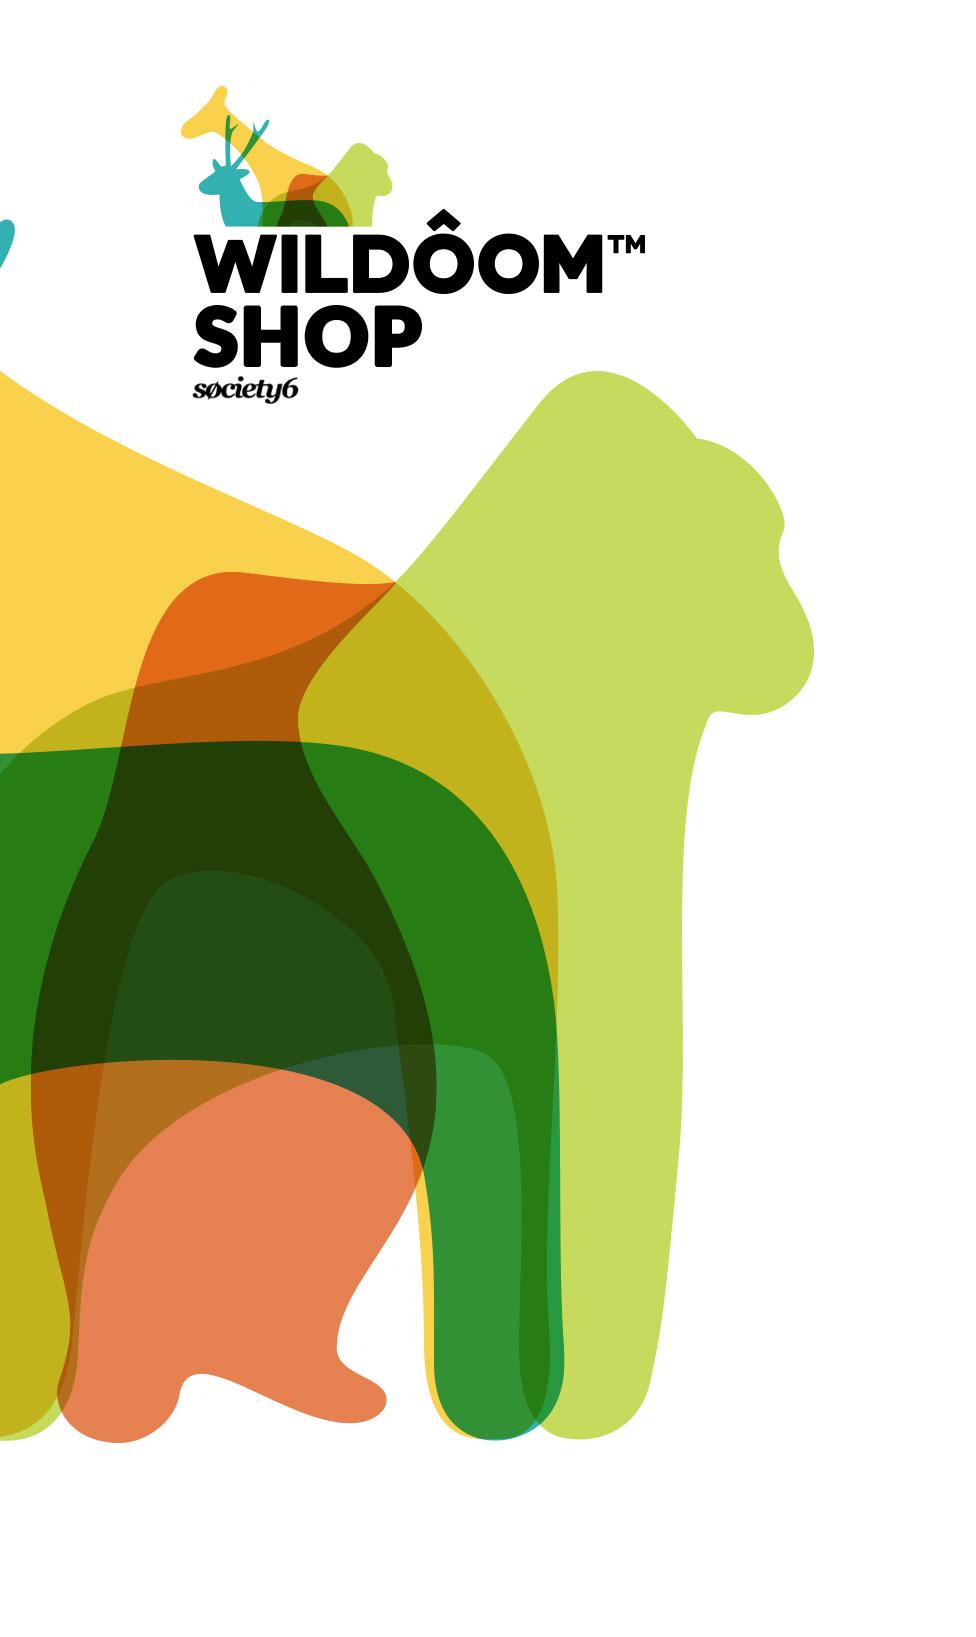 wildôom shop society6